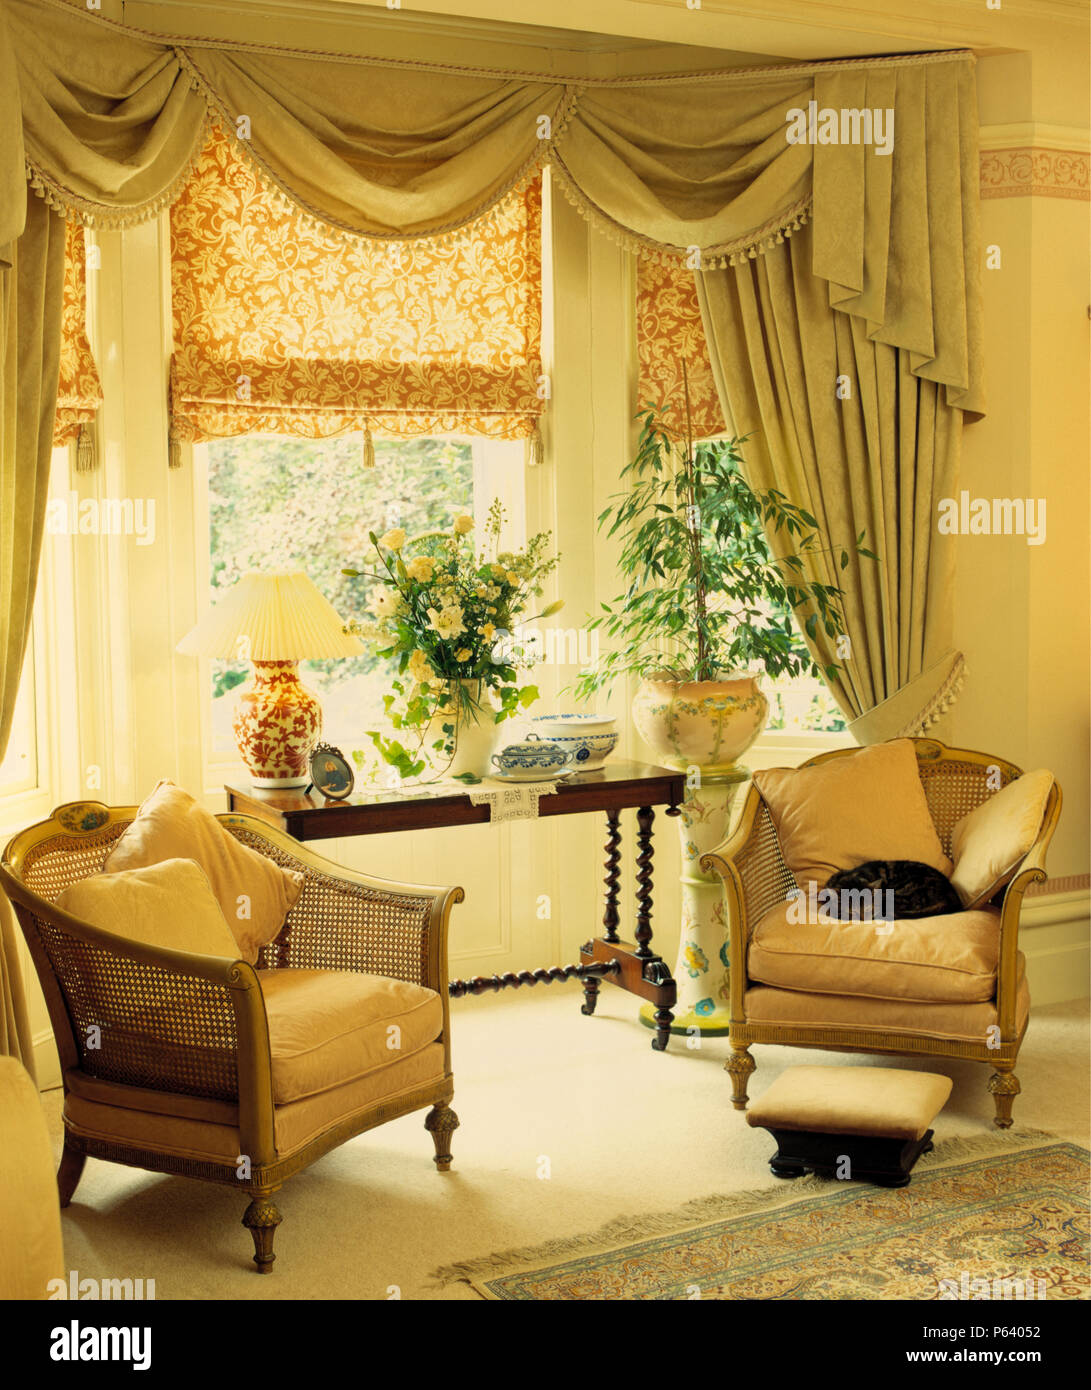 Living Room With Vintage Bergere Armchair Beside Bay Window